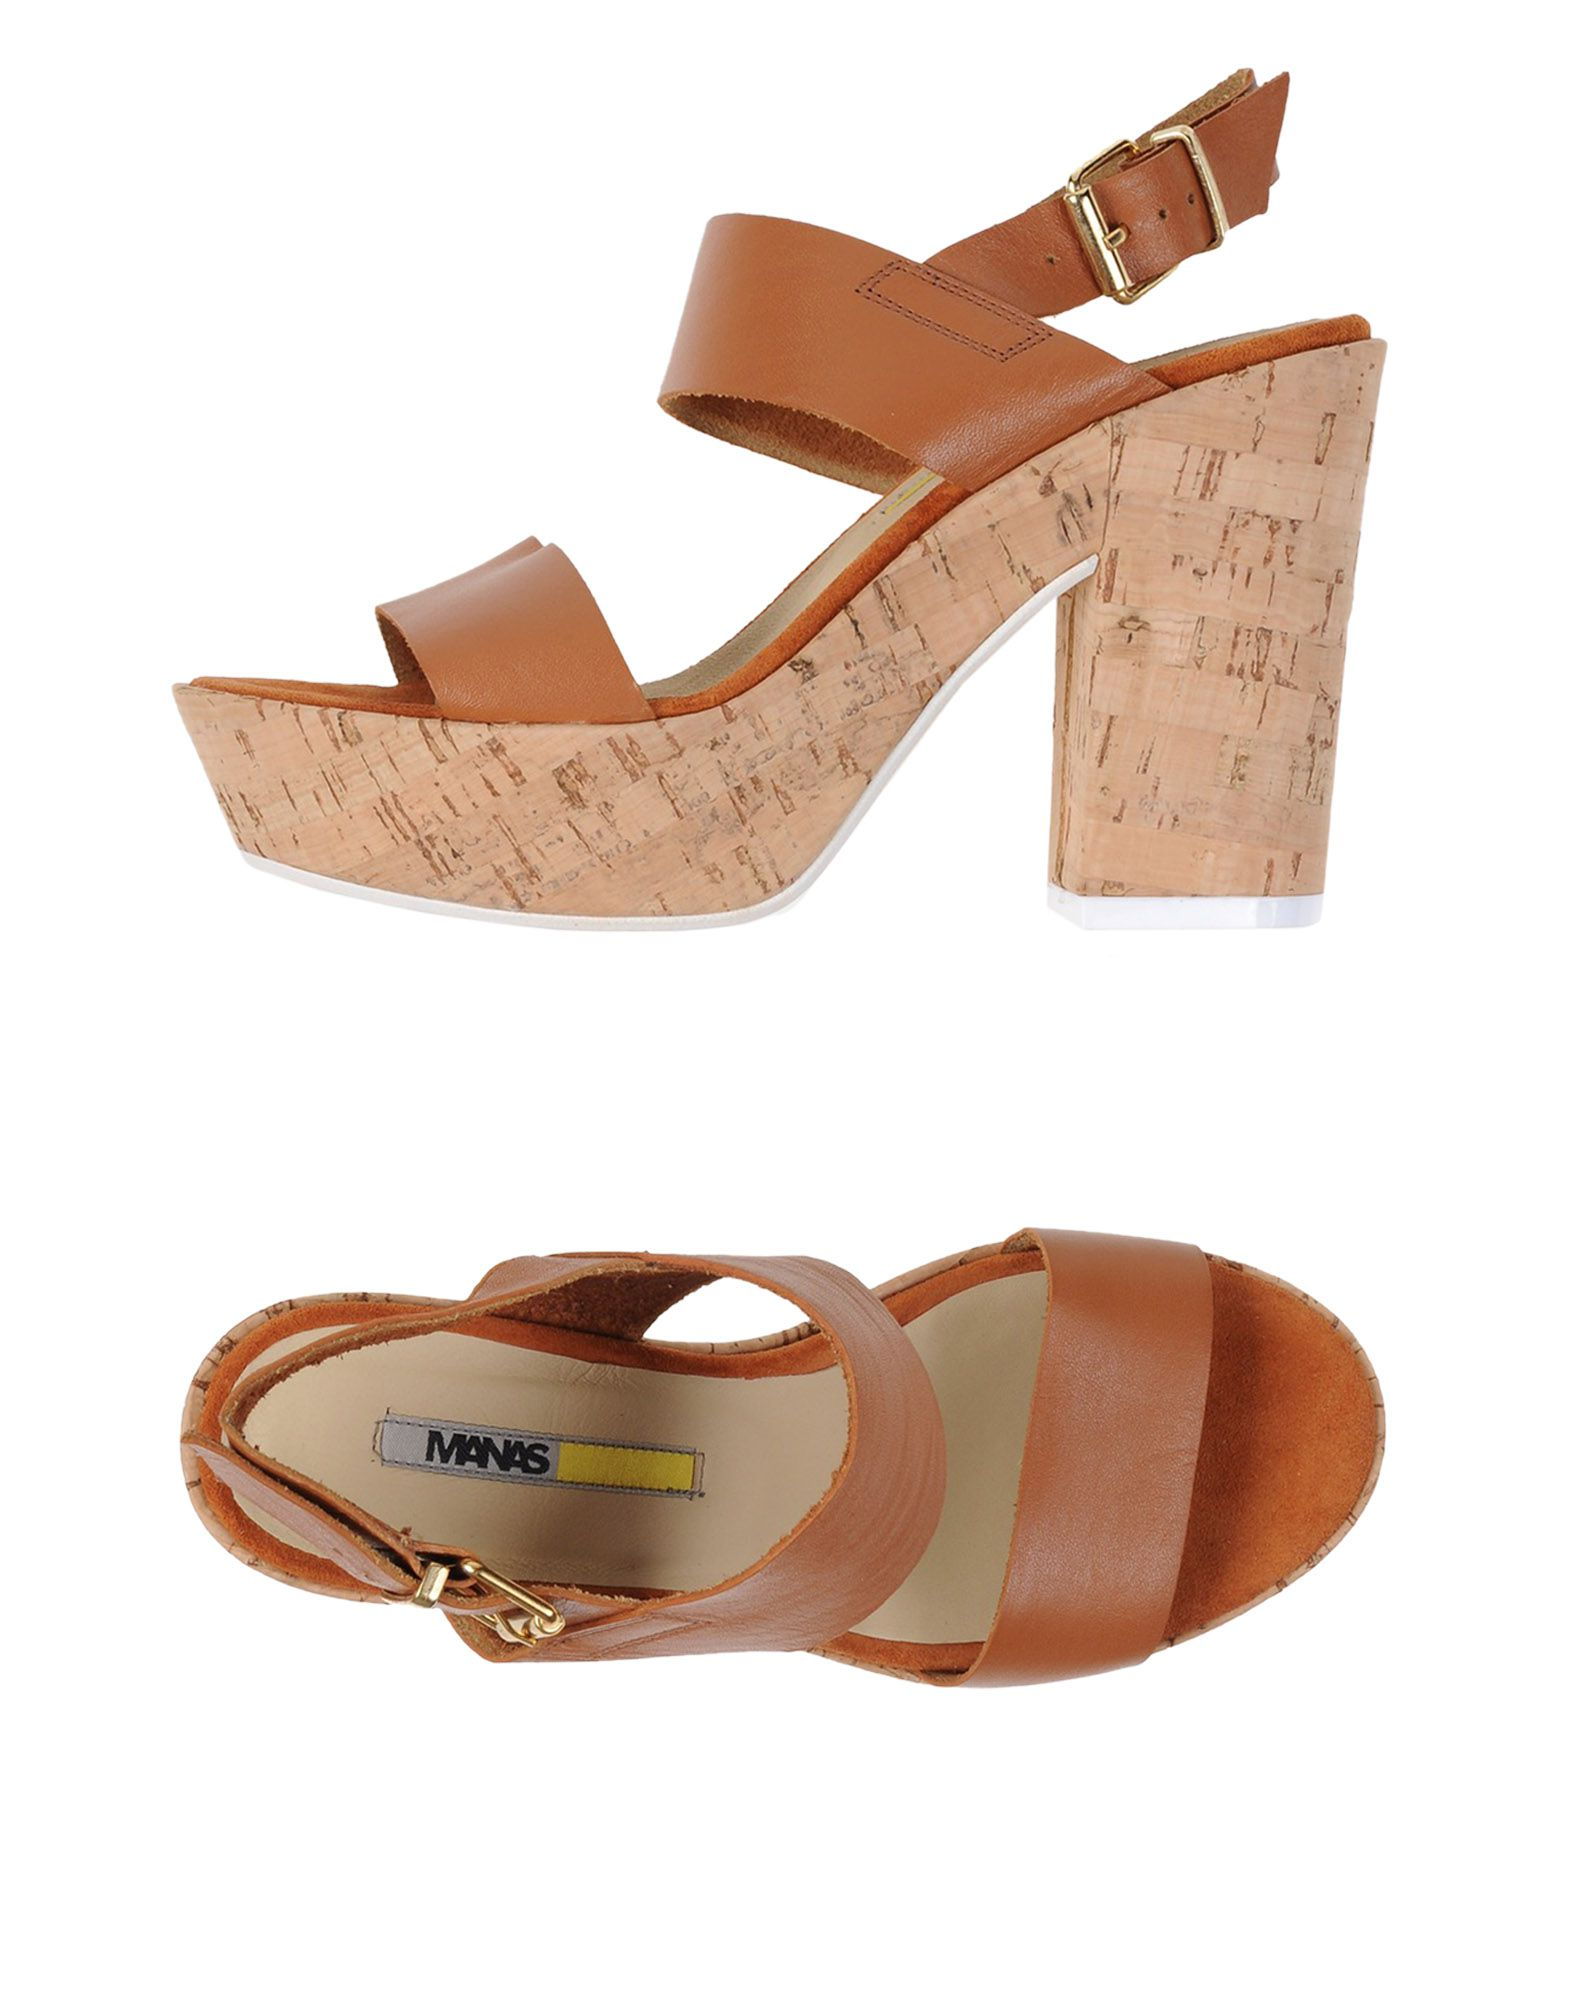 Manas Sandalen Damen  11117371IH Schuhe Gute Qualität beliebte Schuhe 11117371IH b8922a